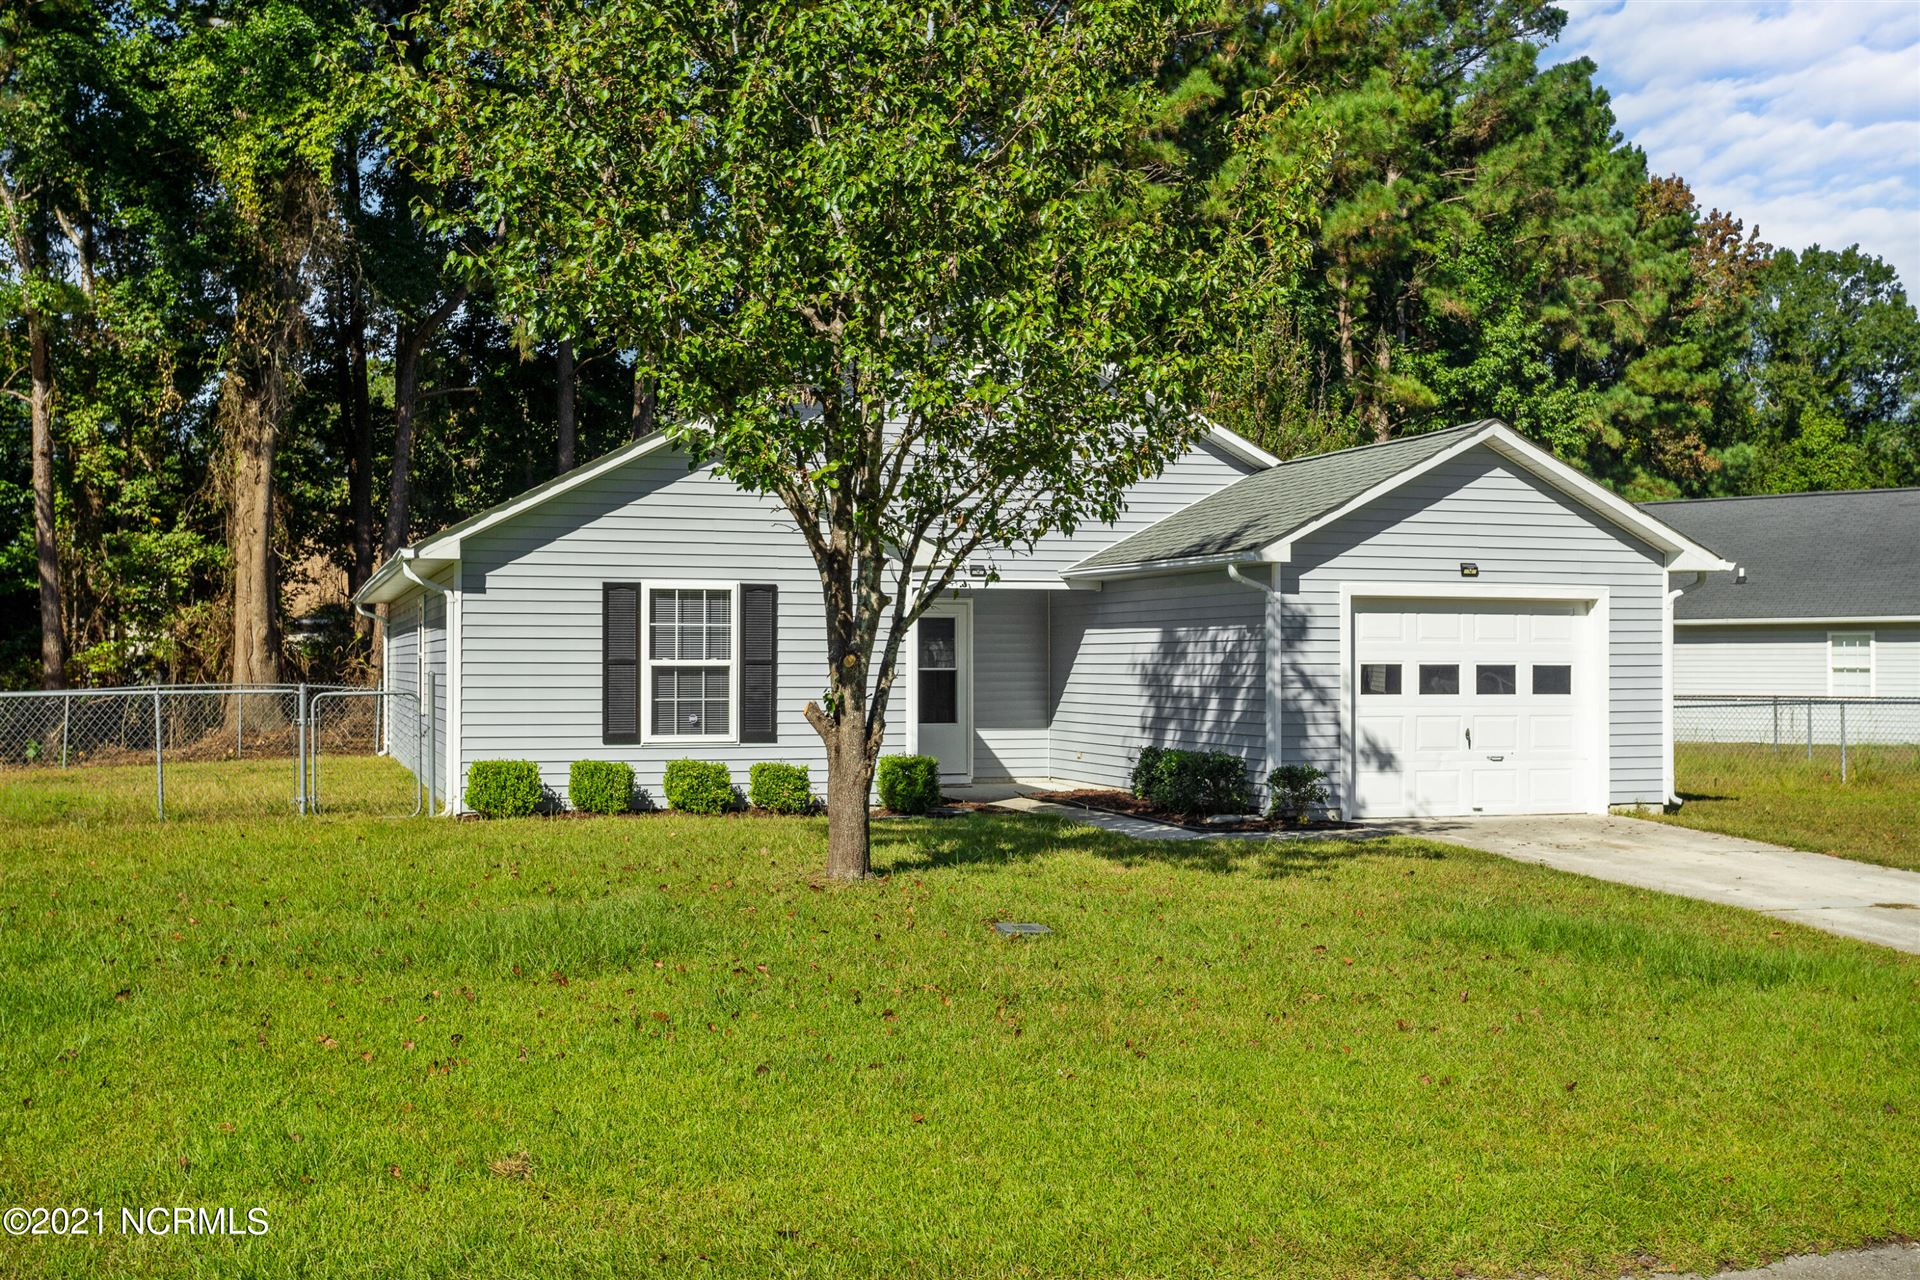 Photo of 1165 Shroyer Circle, Jacksonville, NC 28540 (MLS # 100293432)